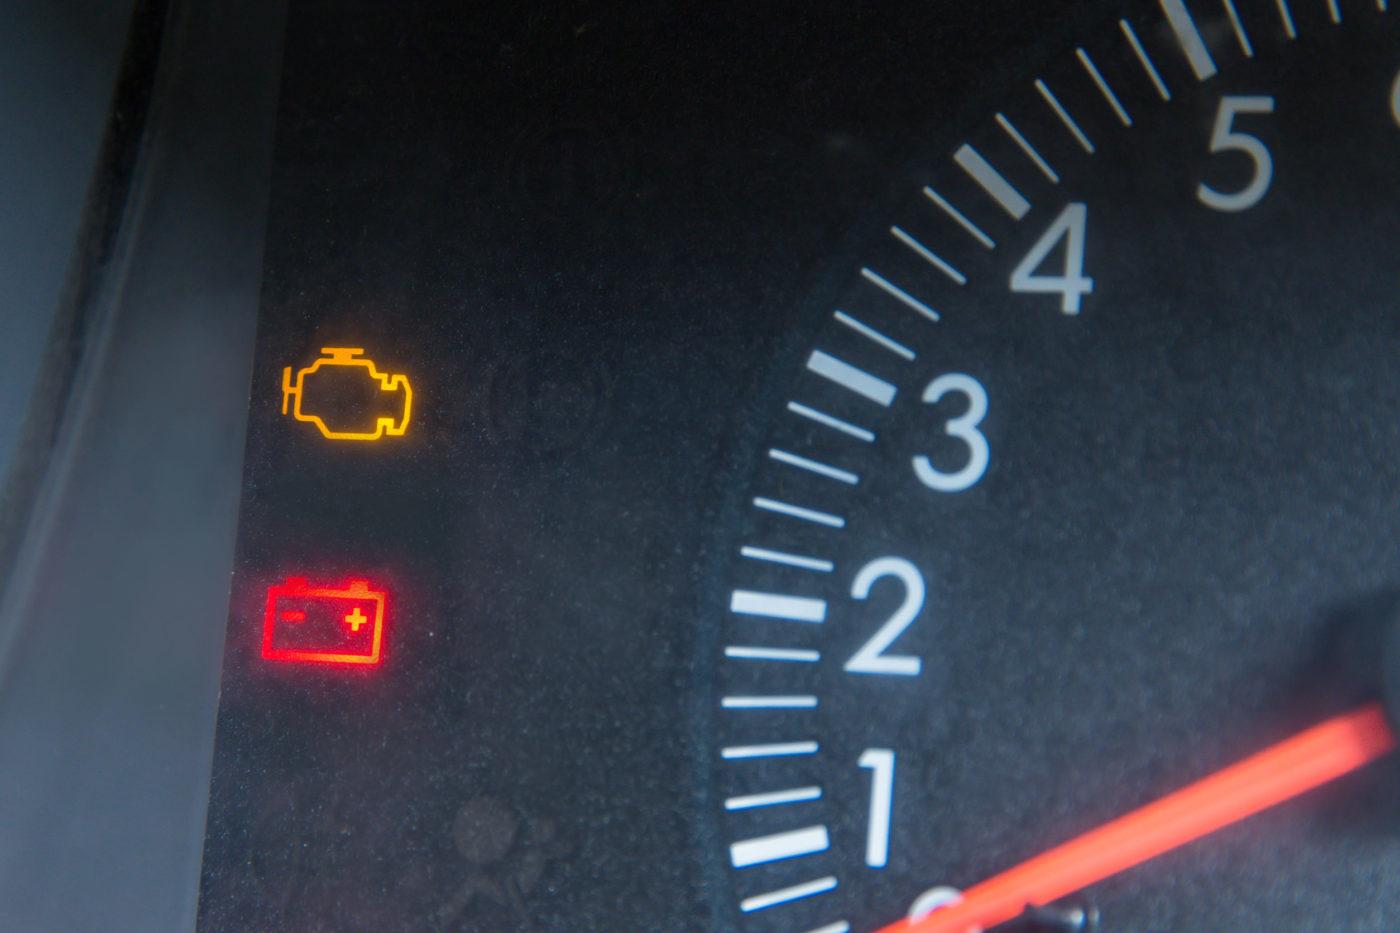 speed display screen in a car